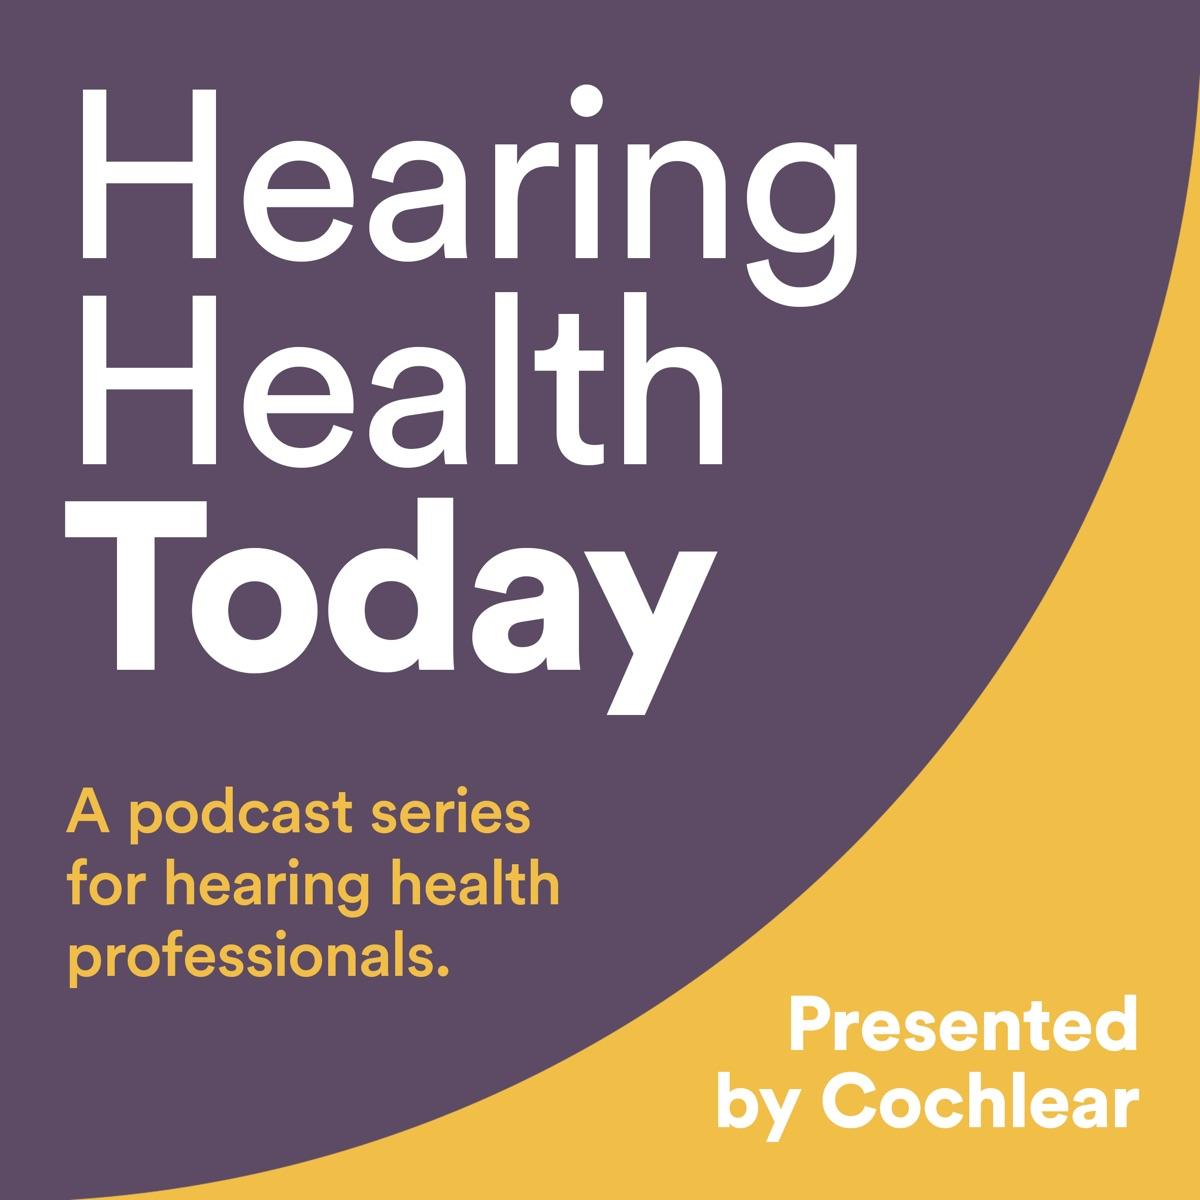 Hearing Health Today